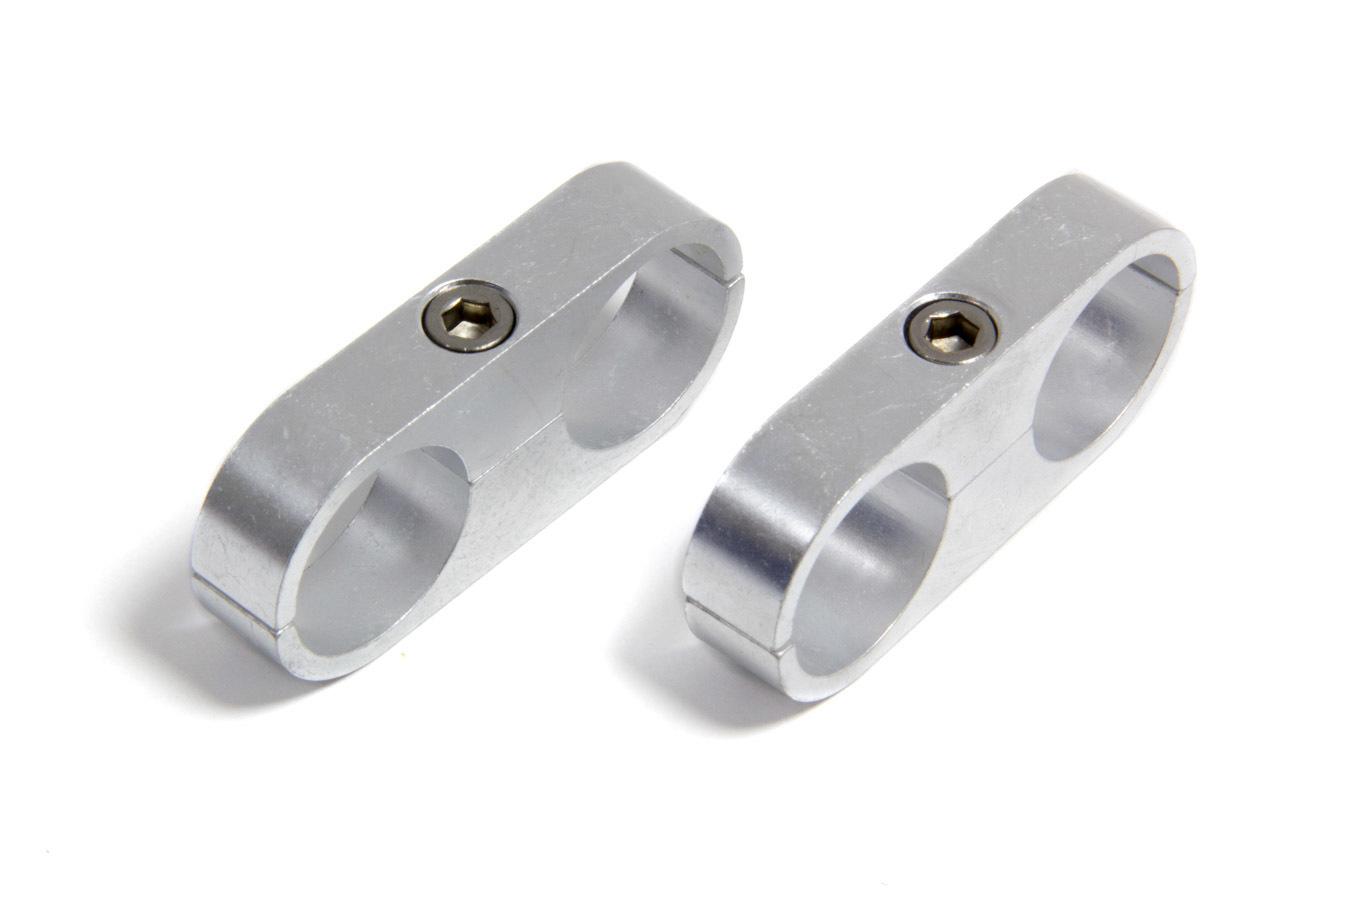 Earls 1in. Polished Alum. Hose/Tube Separator(2pk)